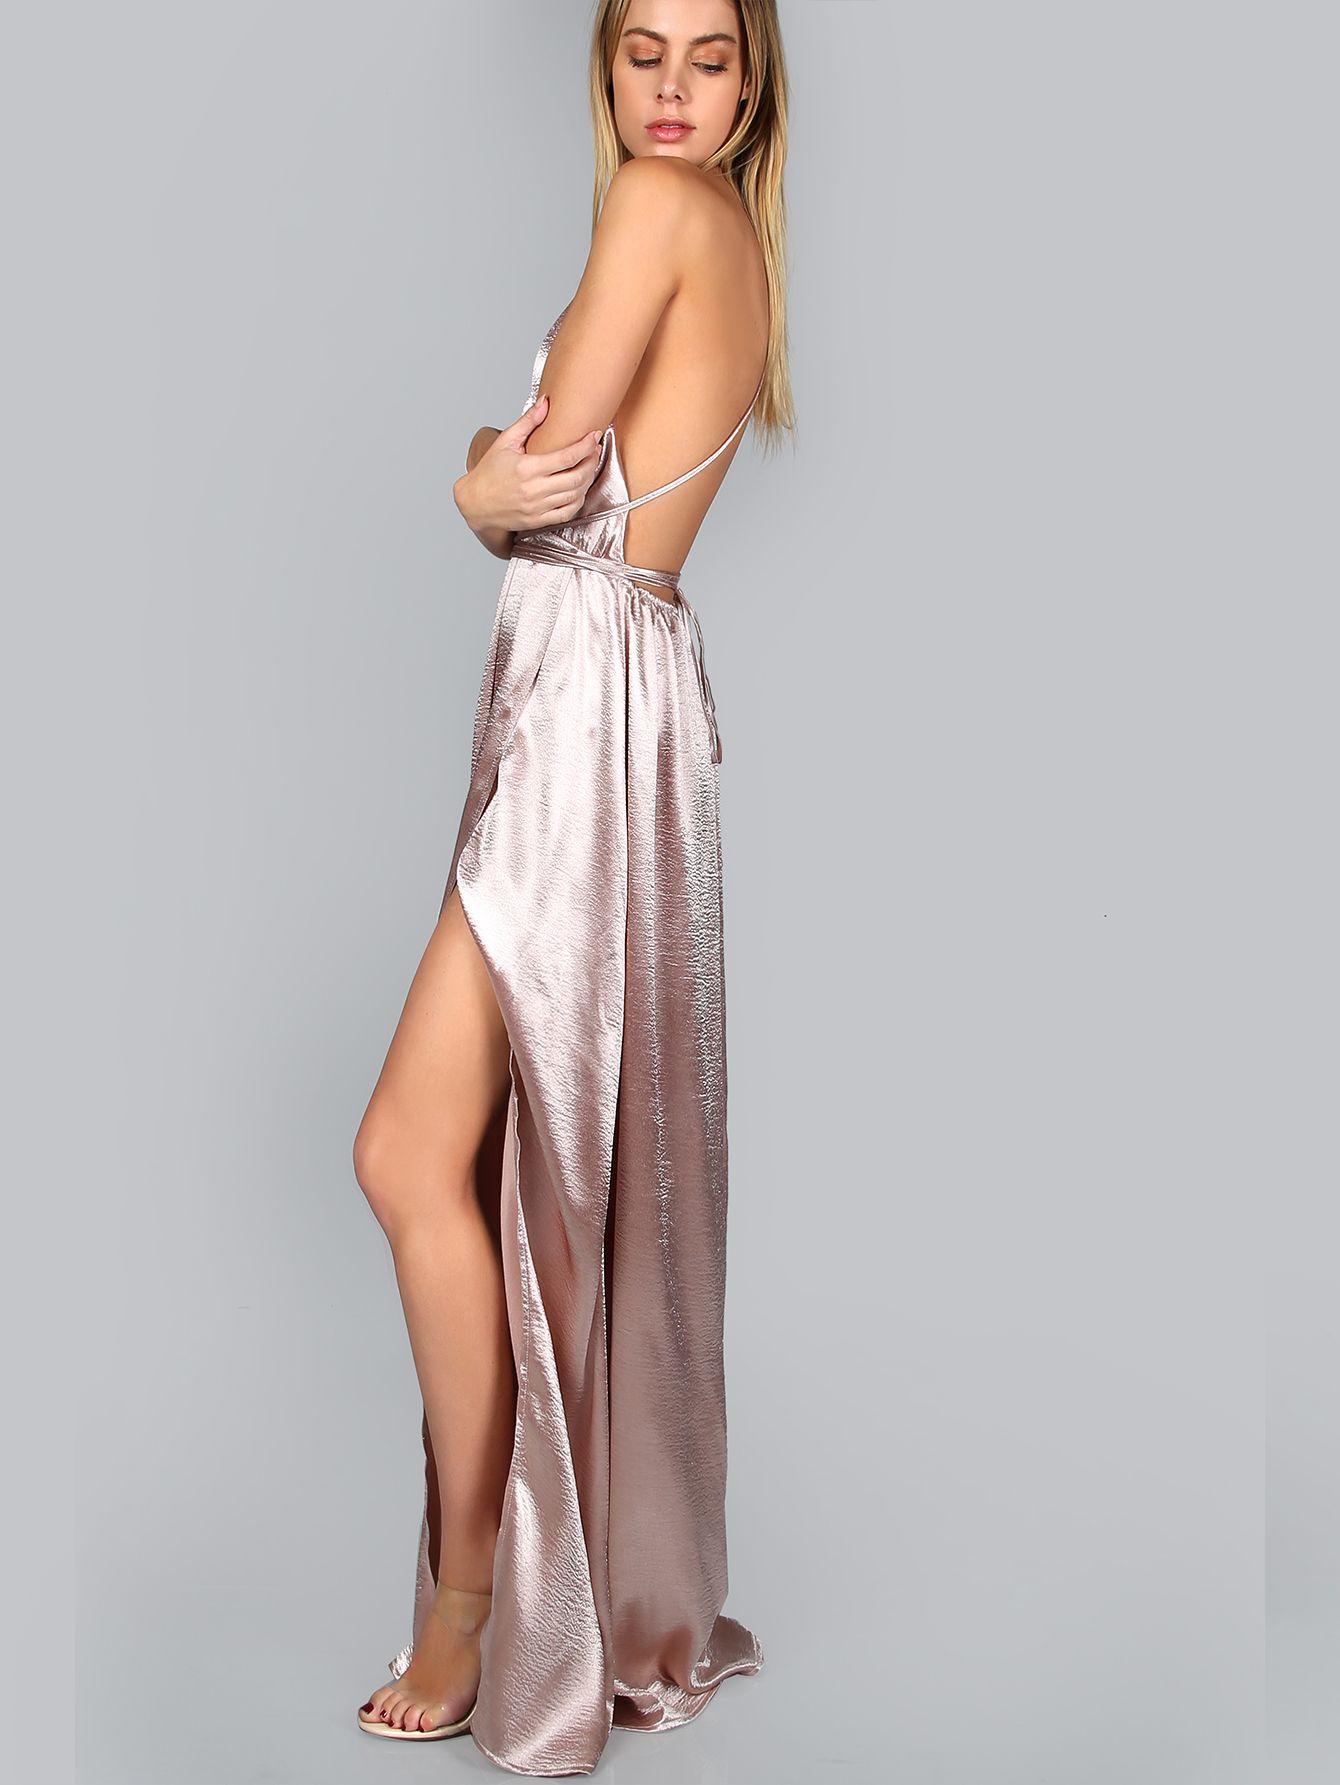 7e5fee9983 Pink Plunge Neck Crisscross Back High Slit Wrap Cami Dress -SheIn(Sheinside)